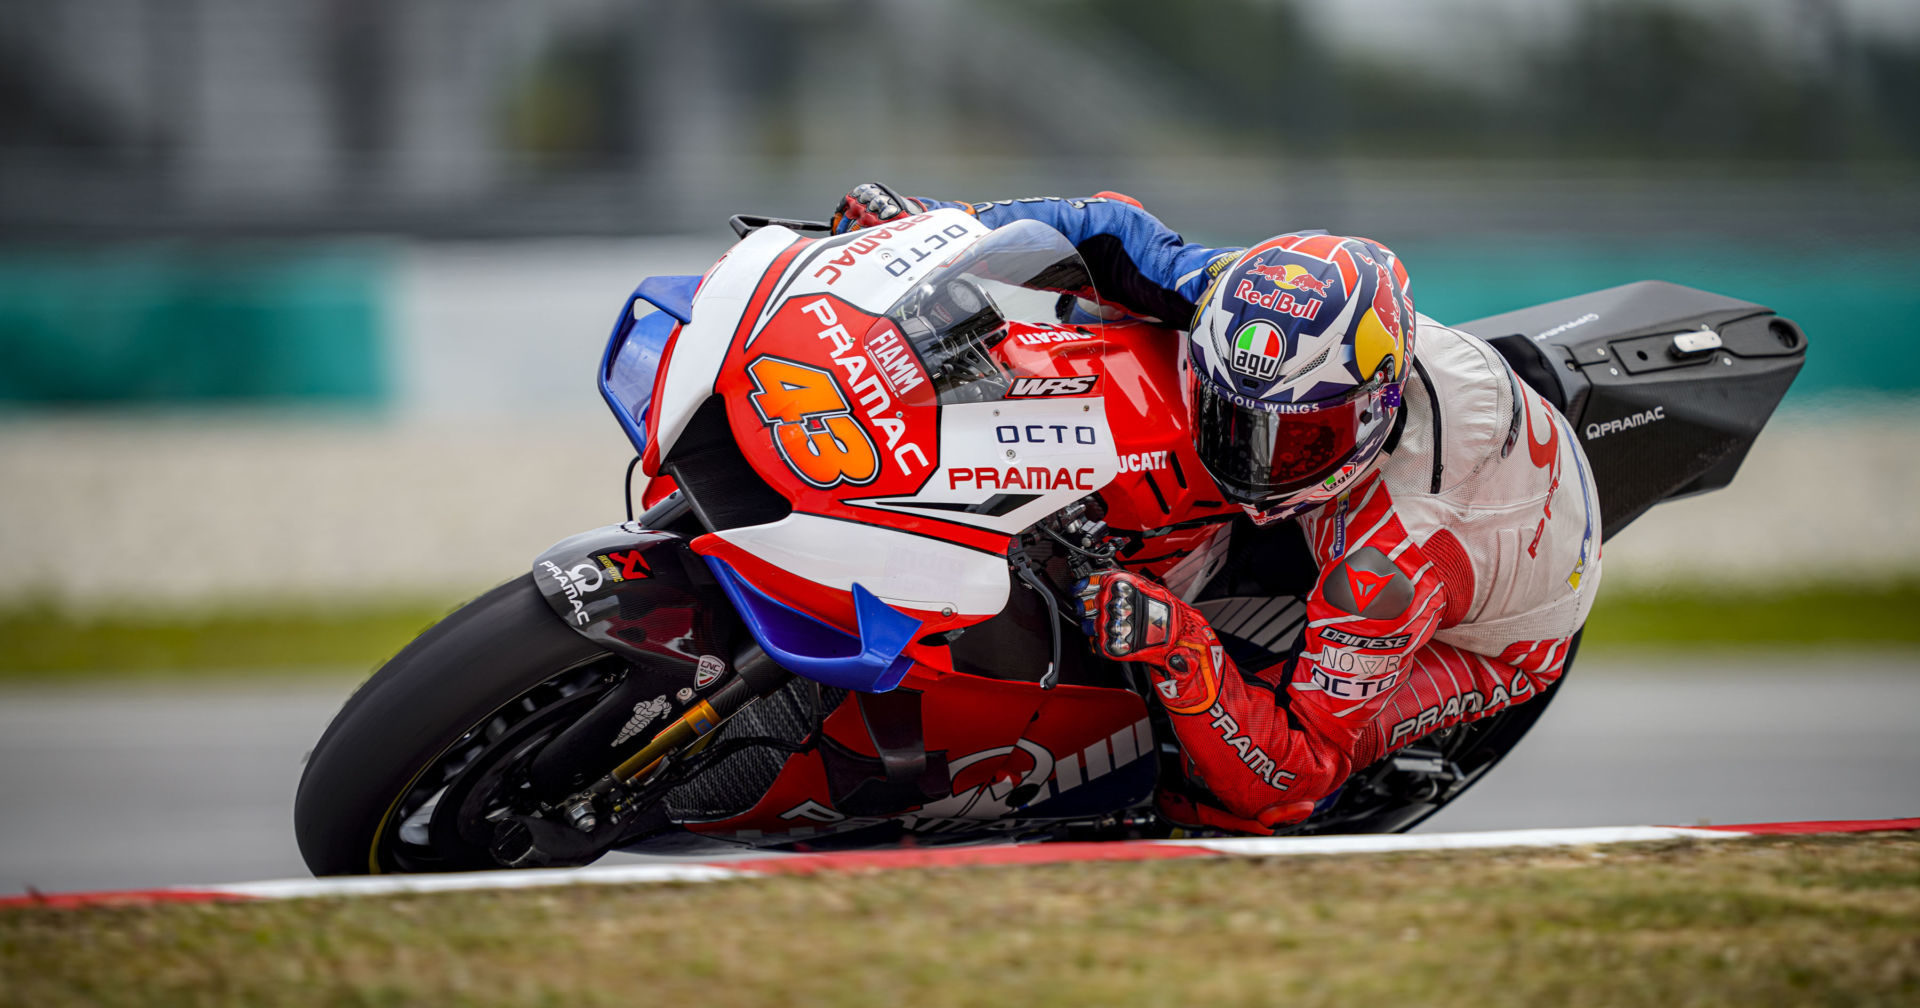 Jack Miller (43) on his Pramac Racing Ducati at the MotoGP pre-season test at Sepang in 2020. Photo courtesy of Pramac Racing.